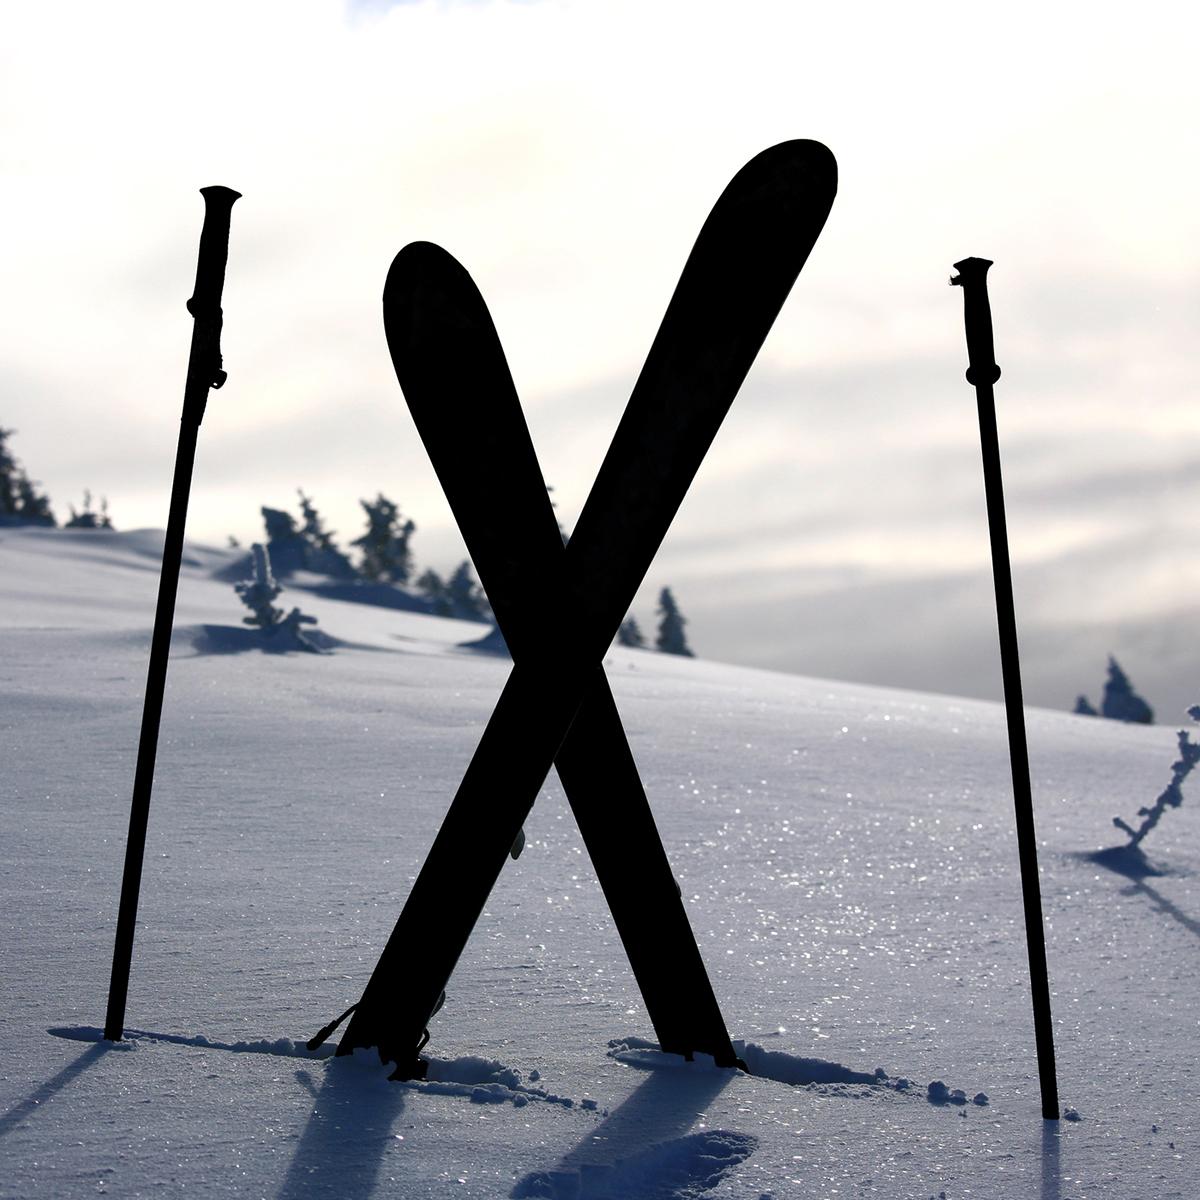 -skier-silhouette-images.jpg